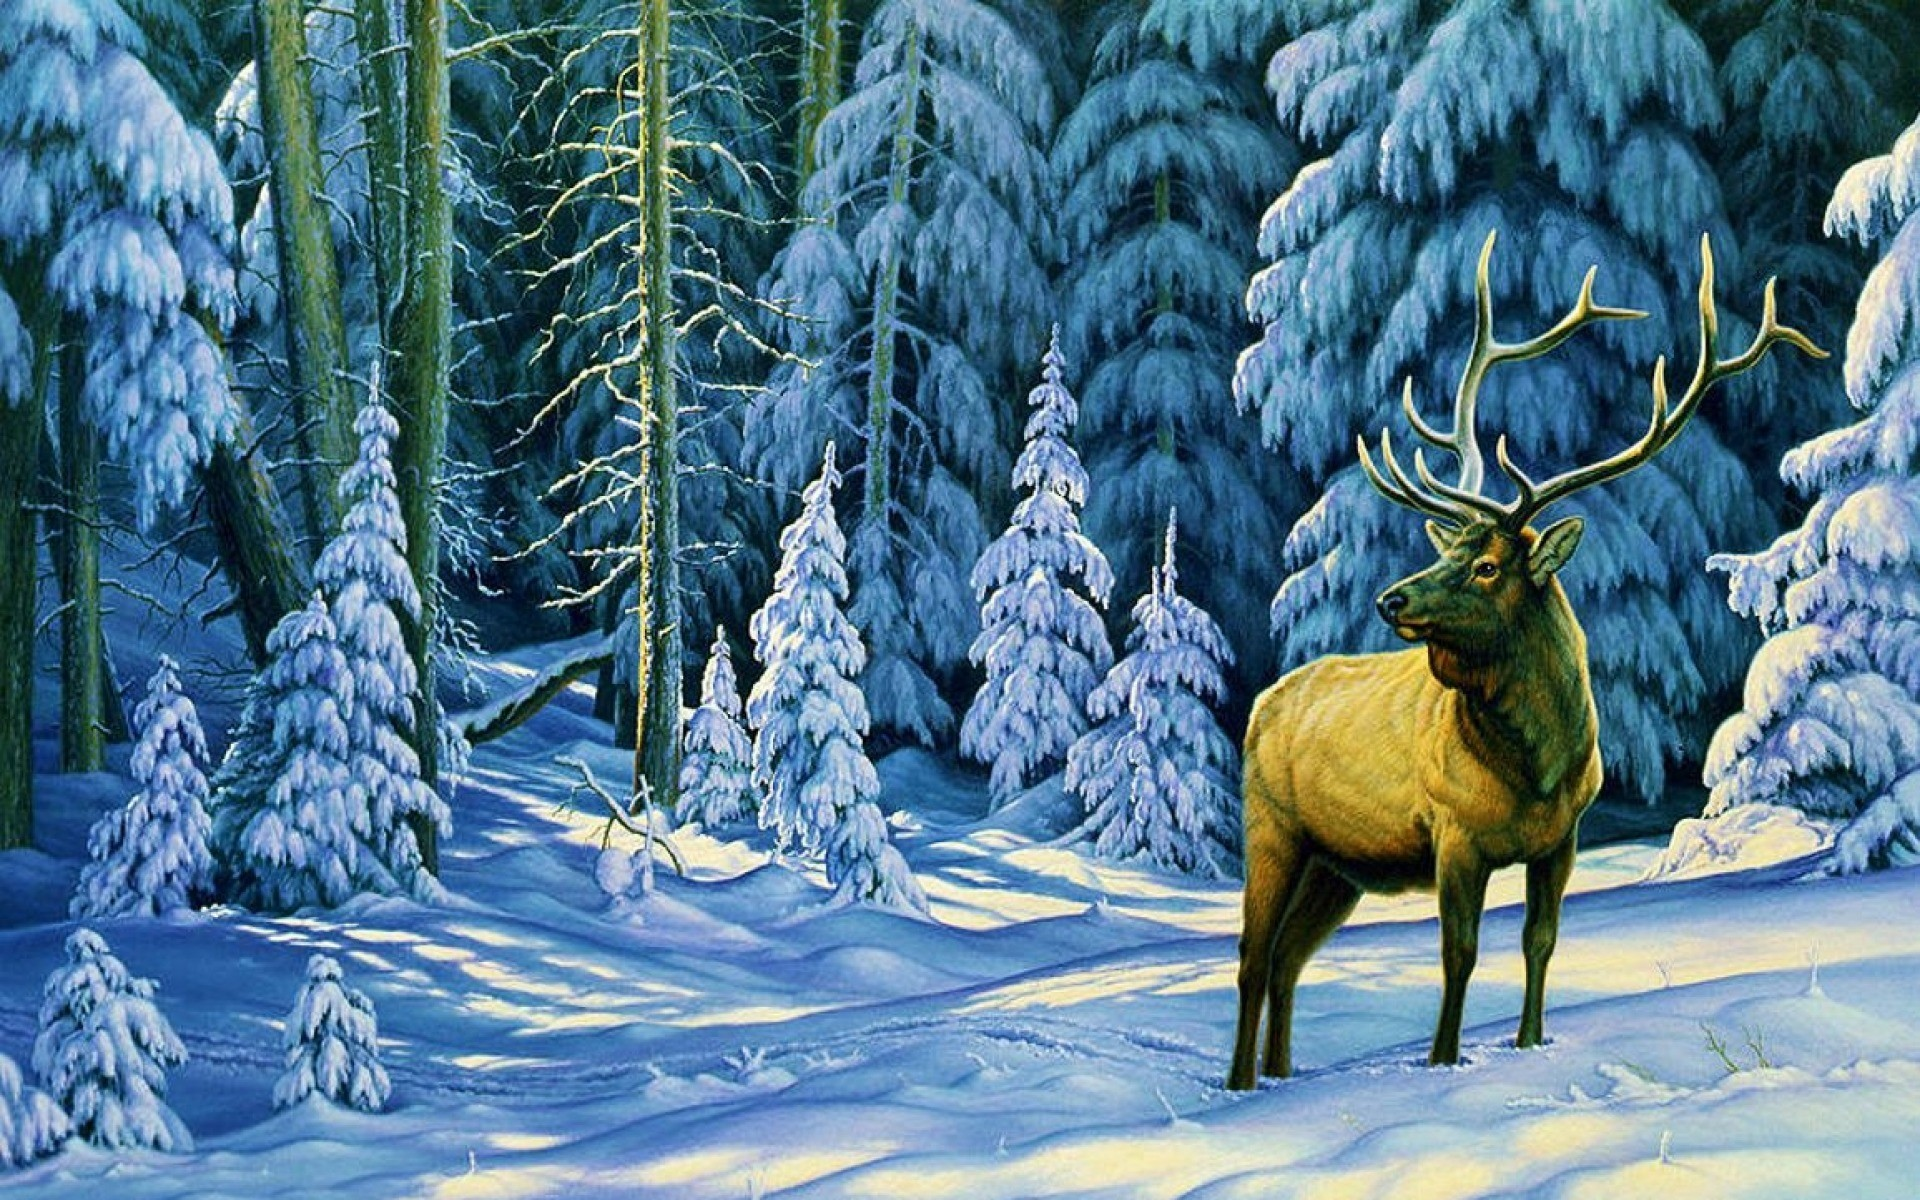 Gallant Deer Winter Forest